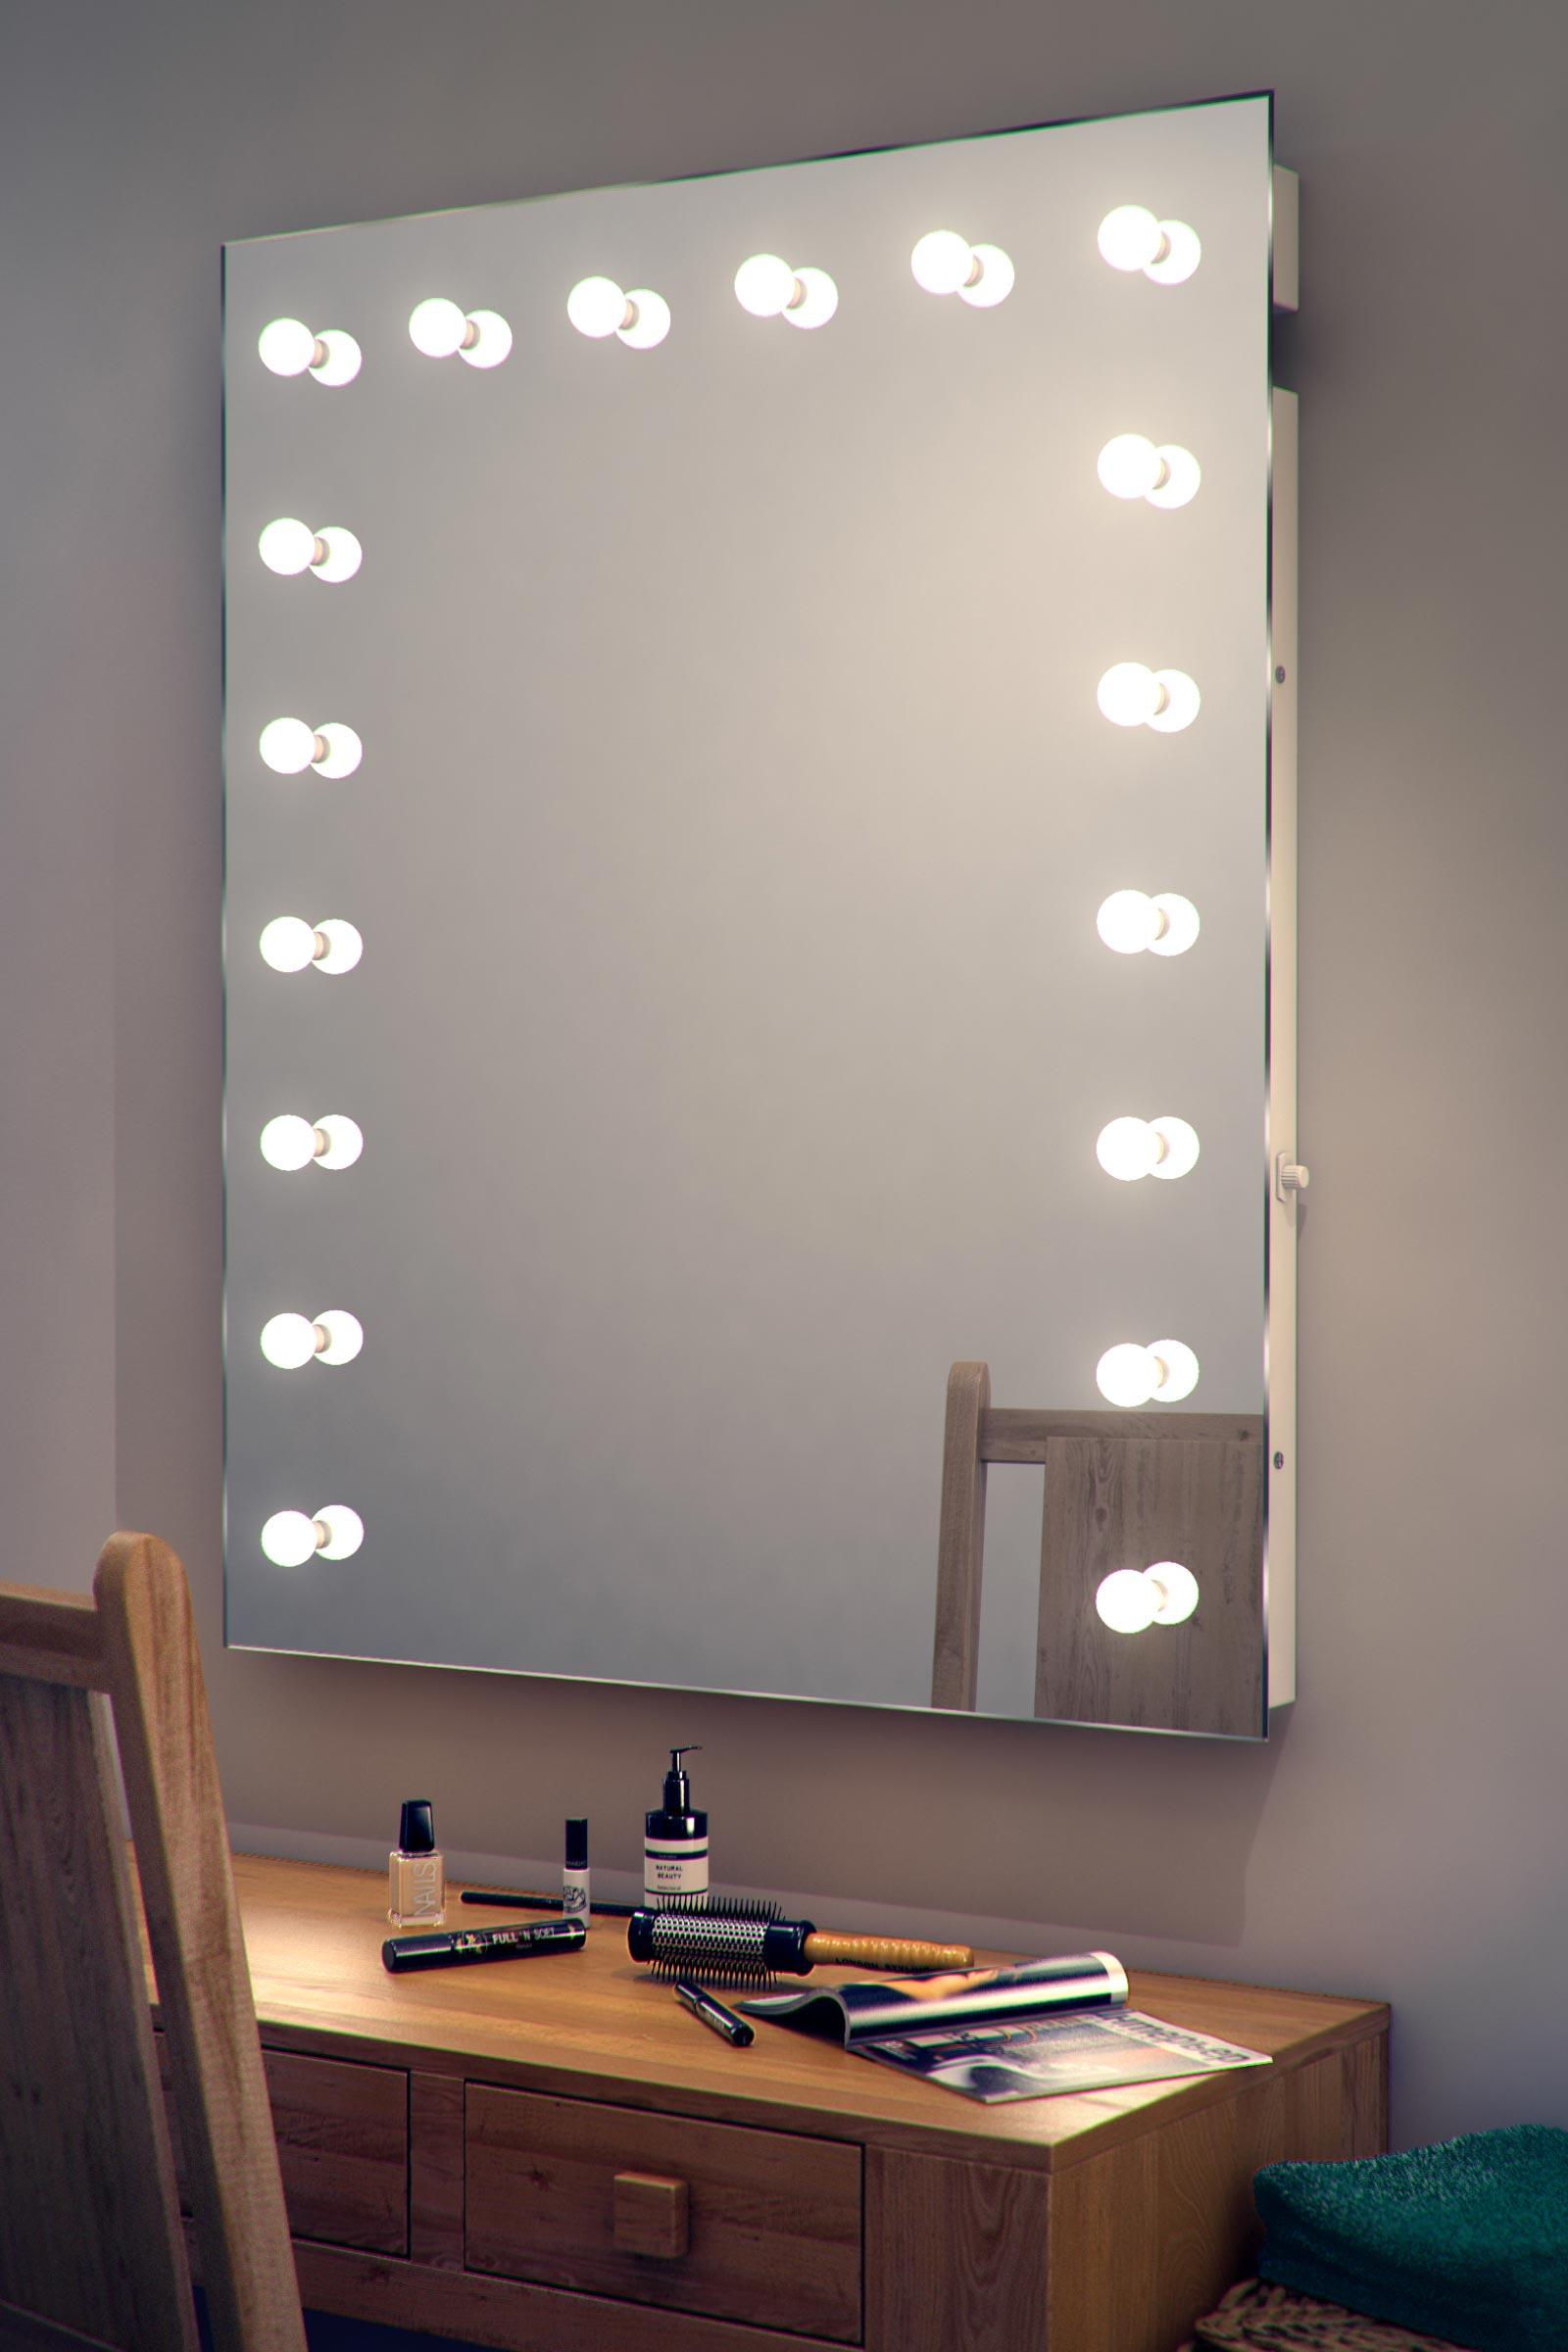 hollywood makeup mirror uk saubhaya makeup. Black Bedroom Furniture Sets. Home Design Ideas